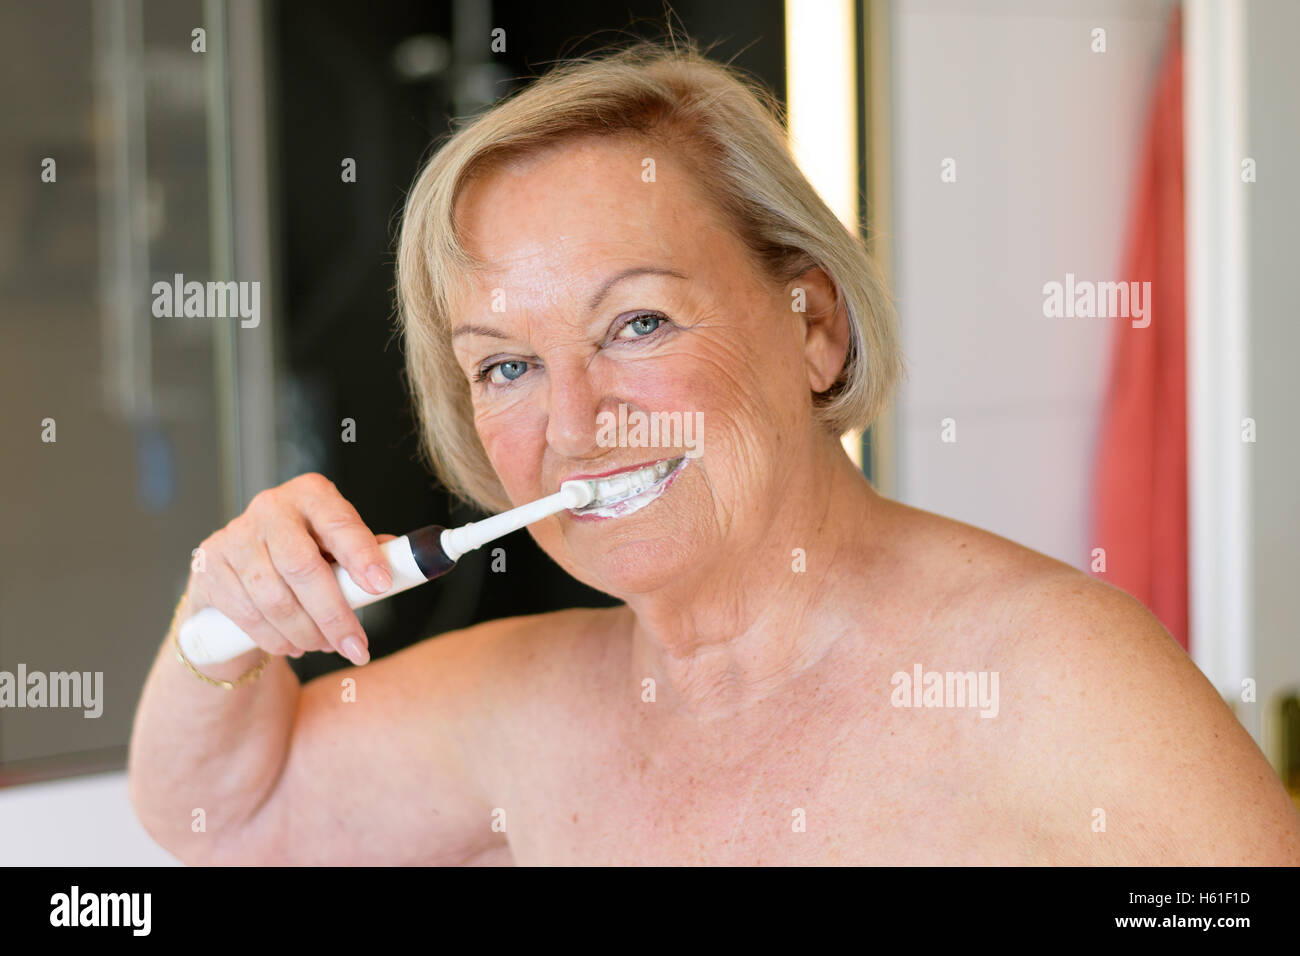 belle femme agee